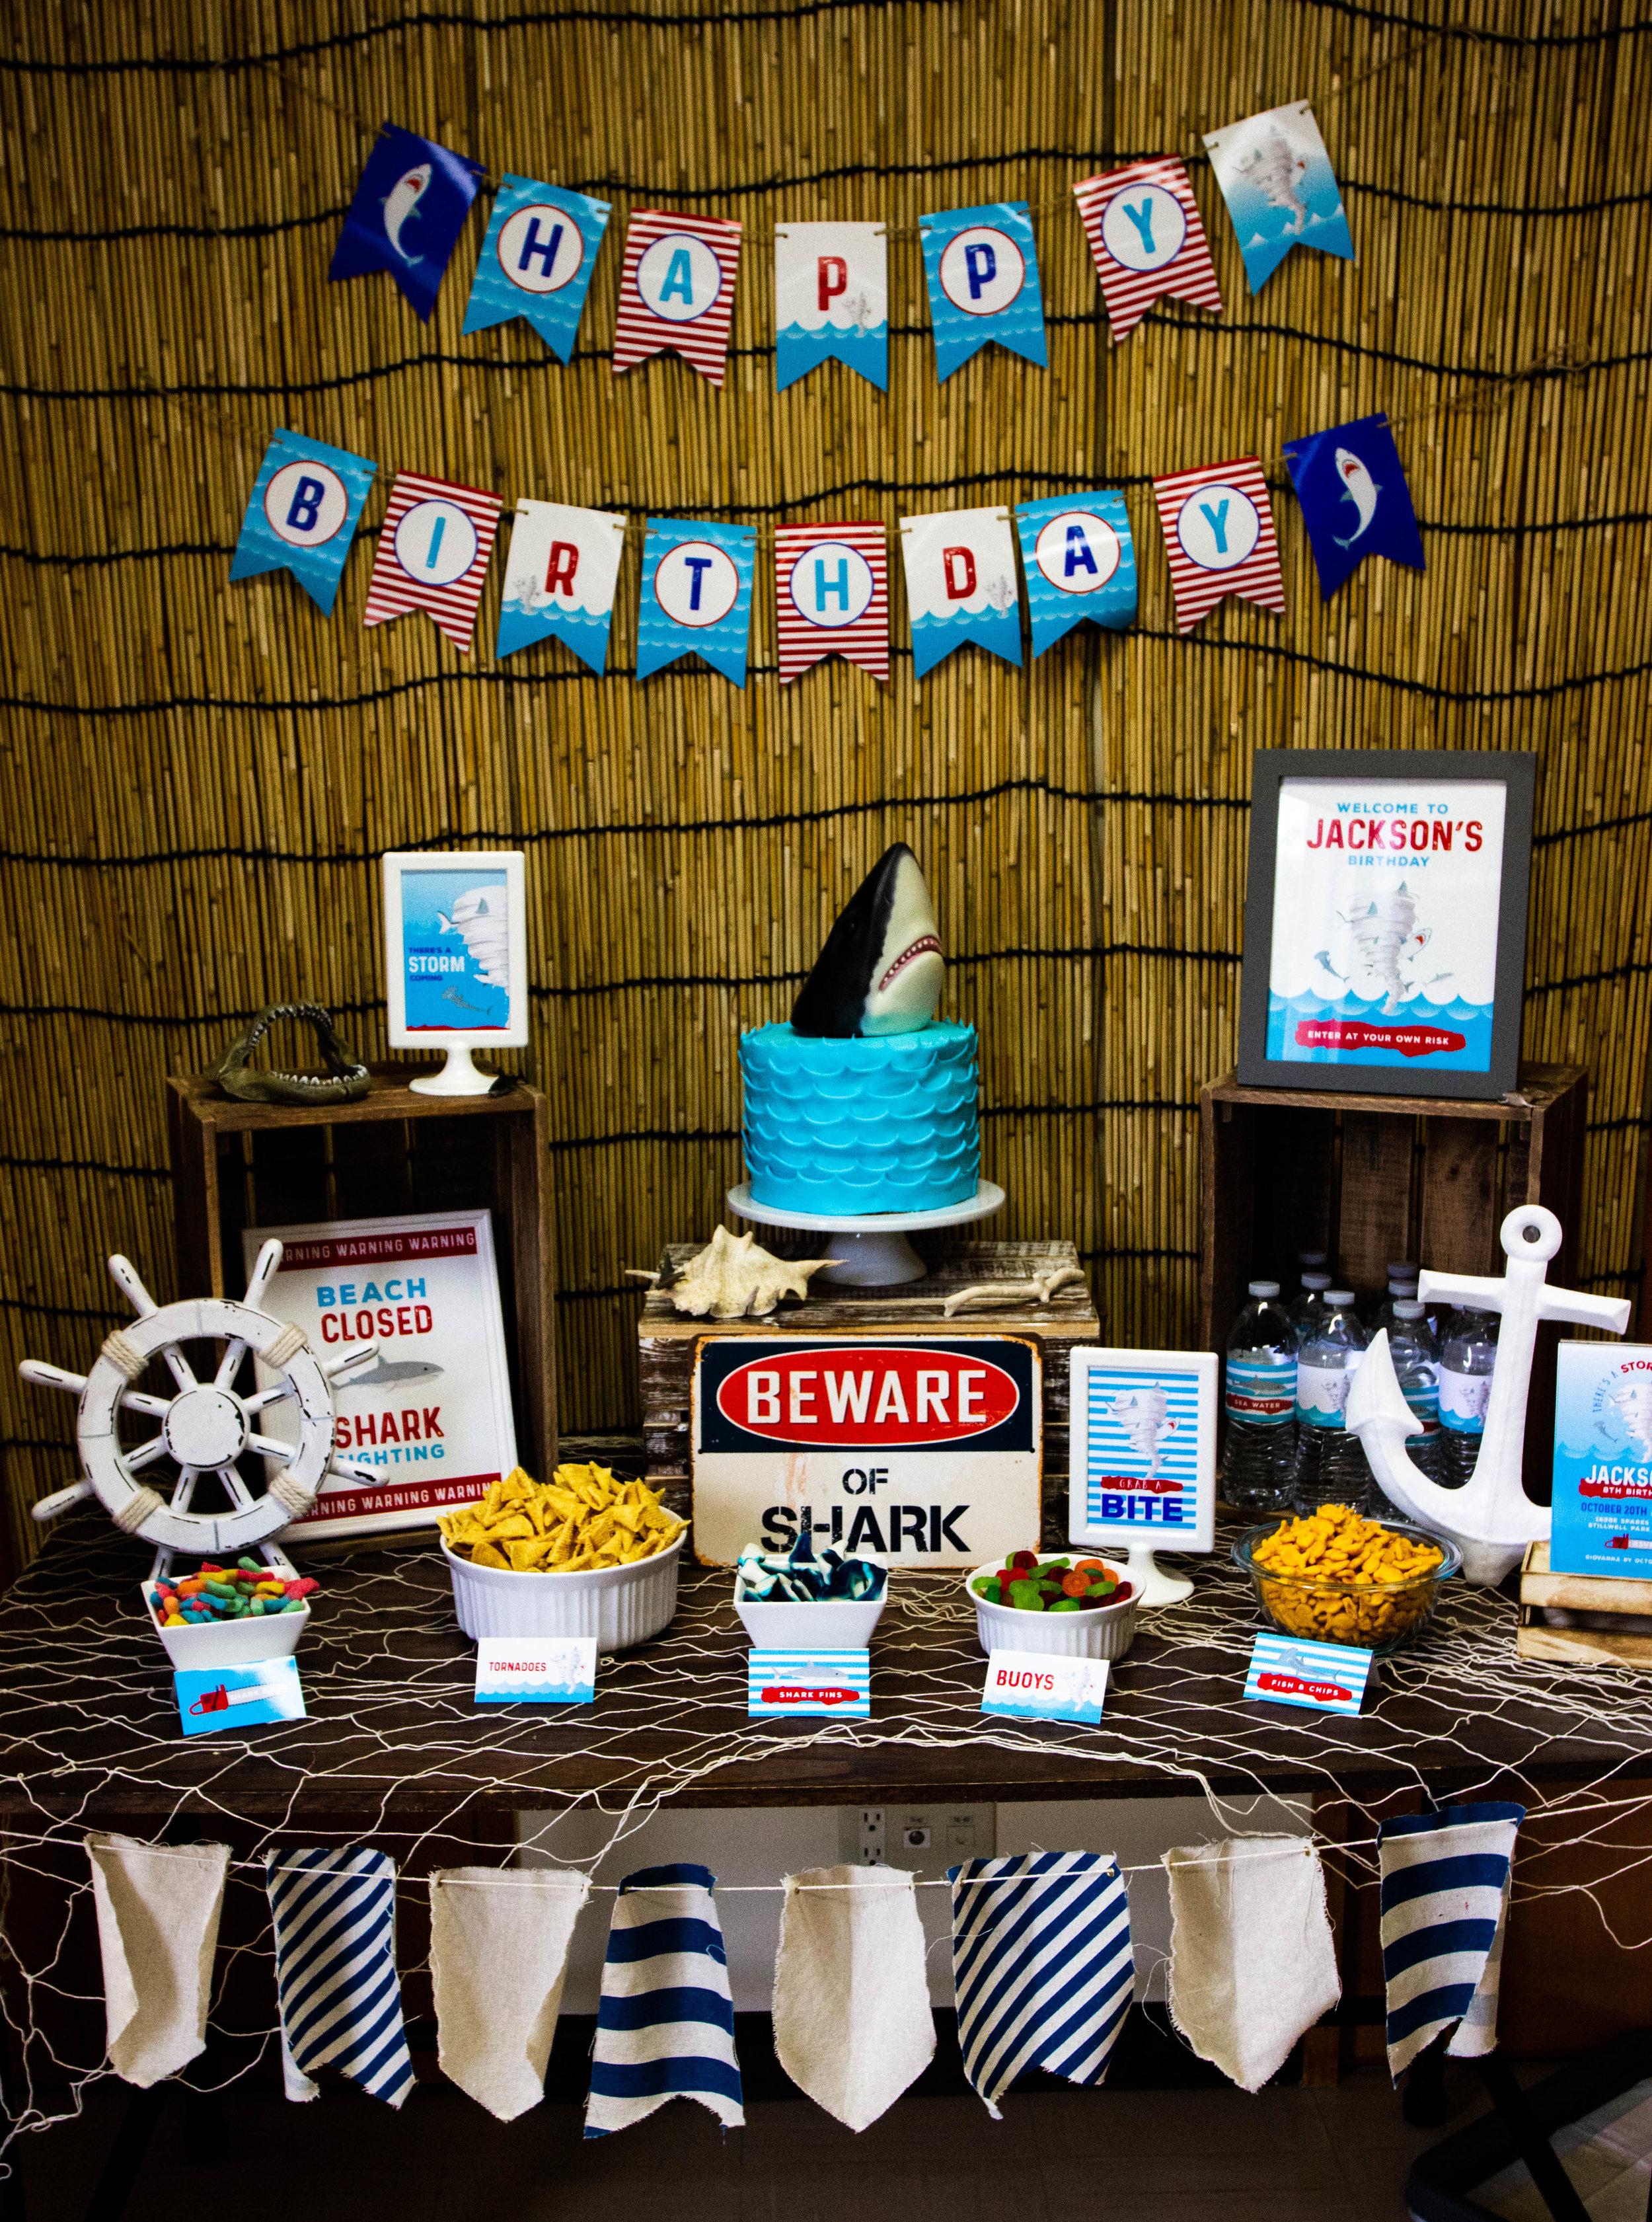 Sharknado Birthday Party theme - Boy Birthday Party Ideas // mkkm designs